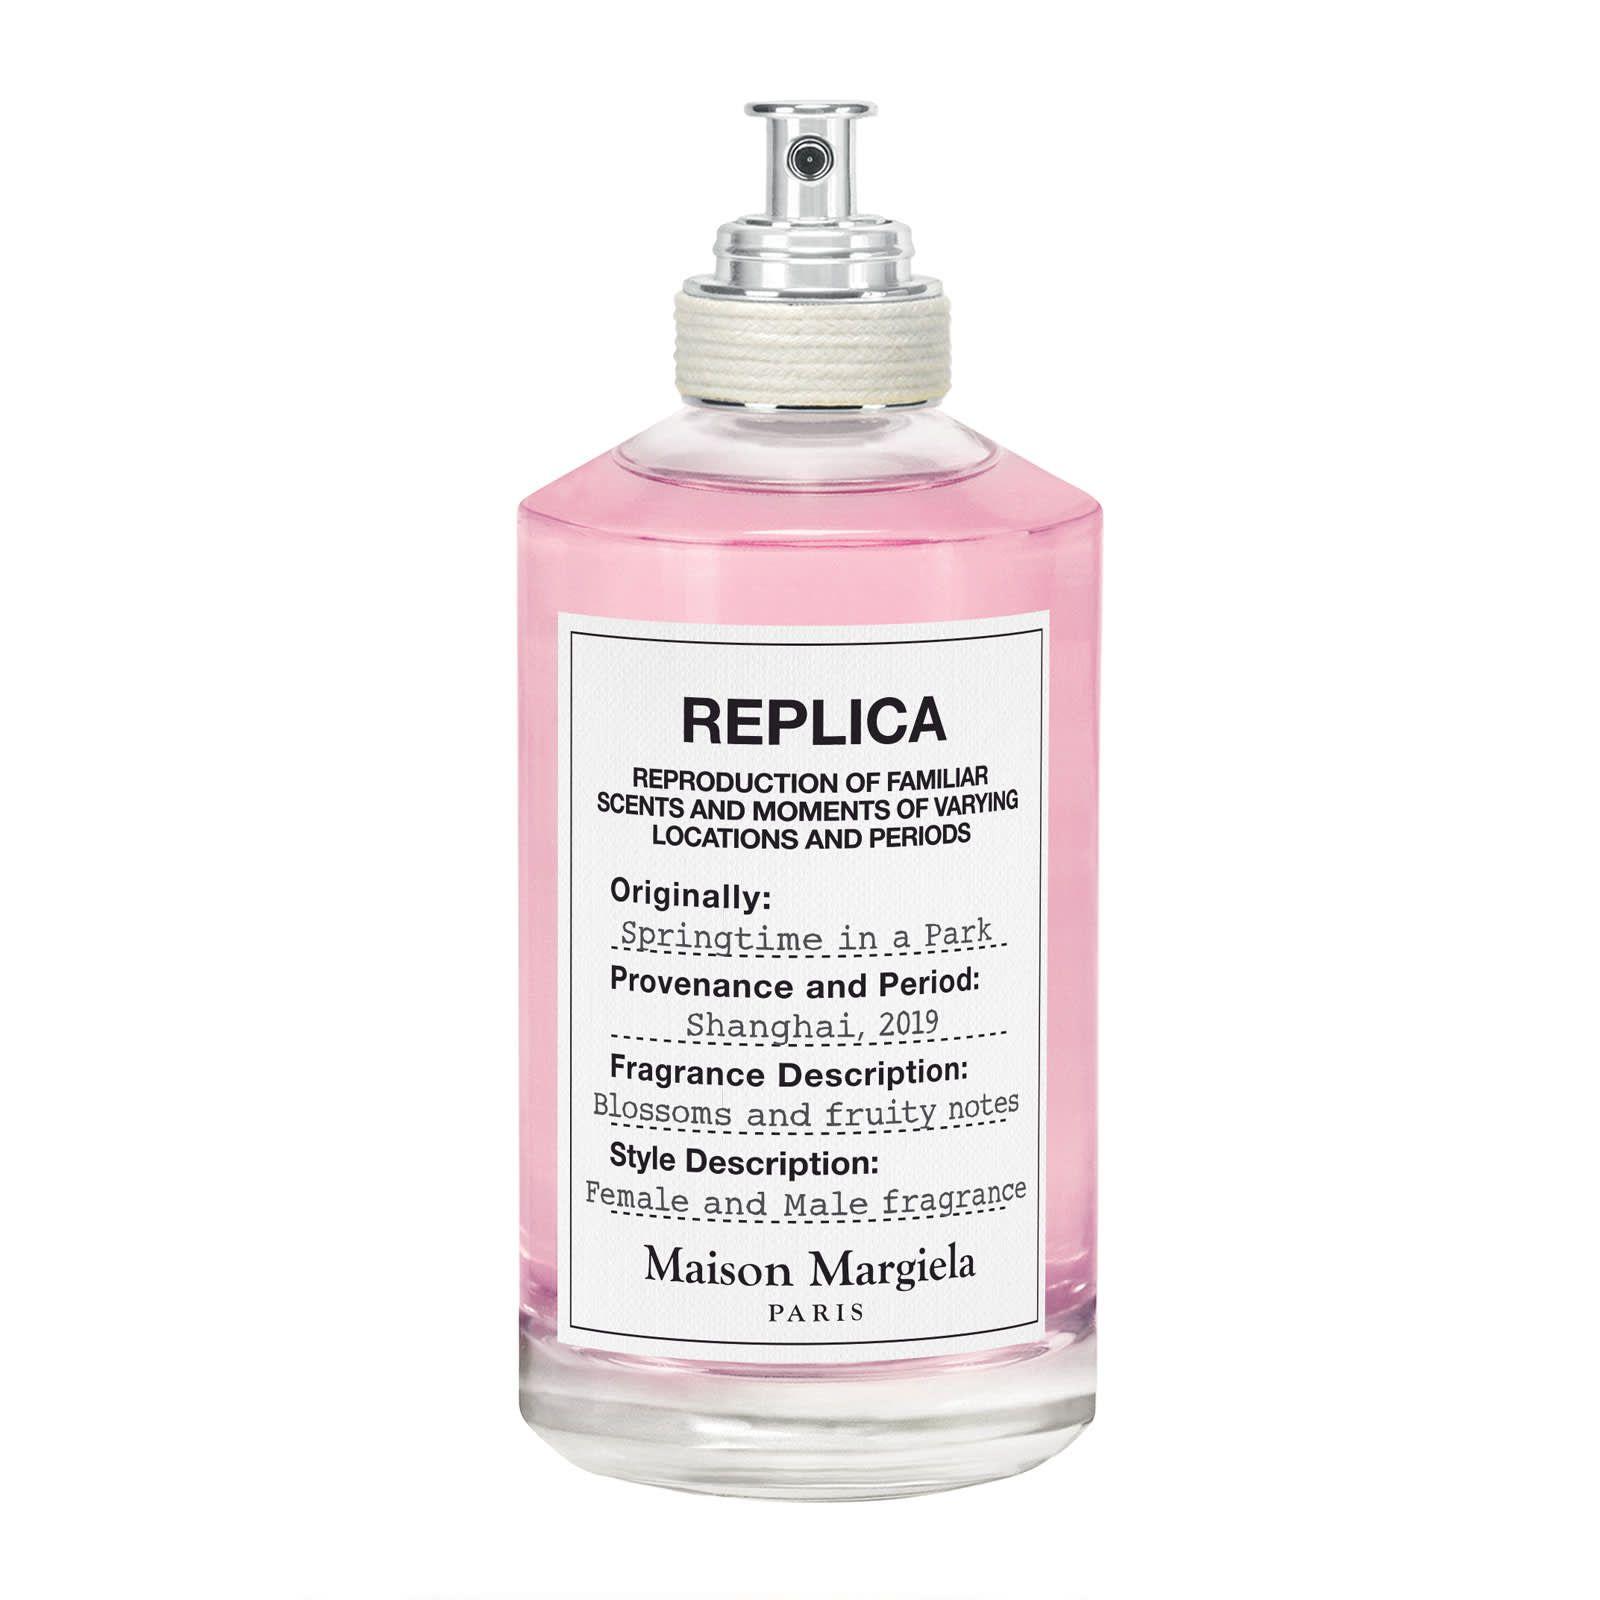 Best Women S Perfume 2021 40 New Fragrances Gift Sets We Love